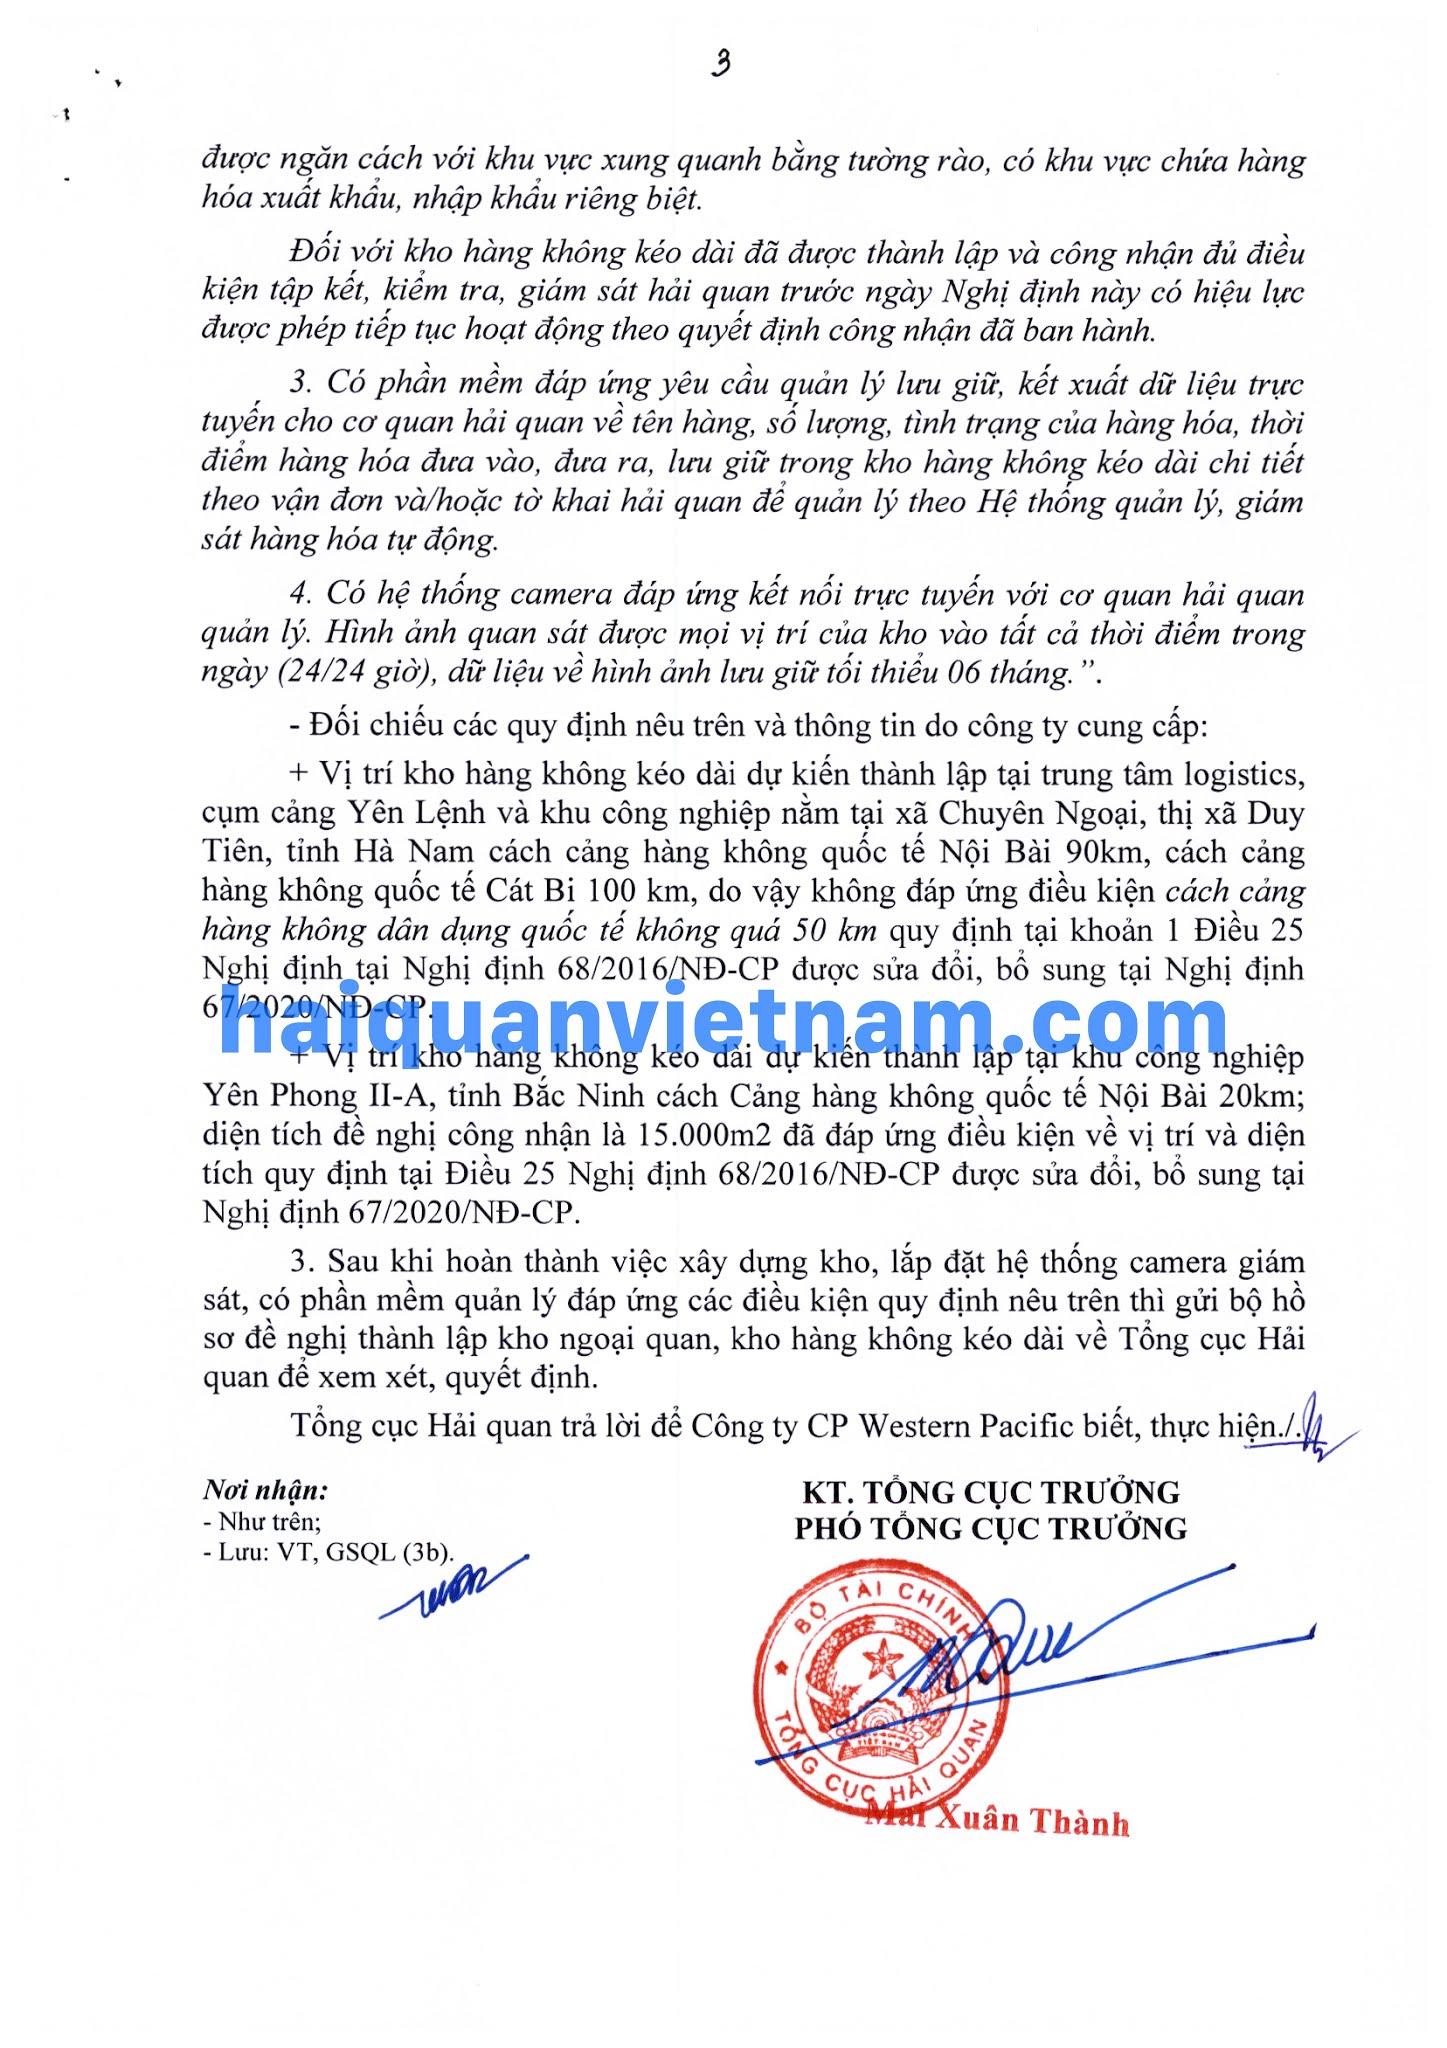 [Image: 210618_2993_TCHQ-GSQL_haiquanvietnam_03.jpg]